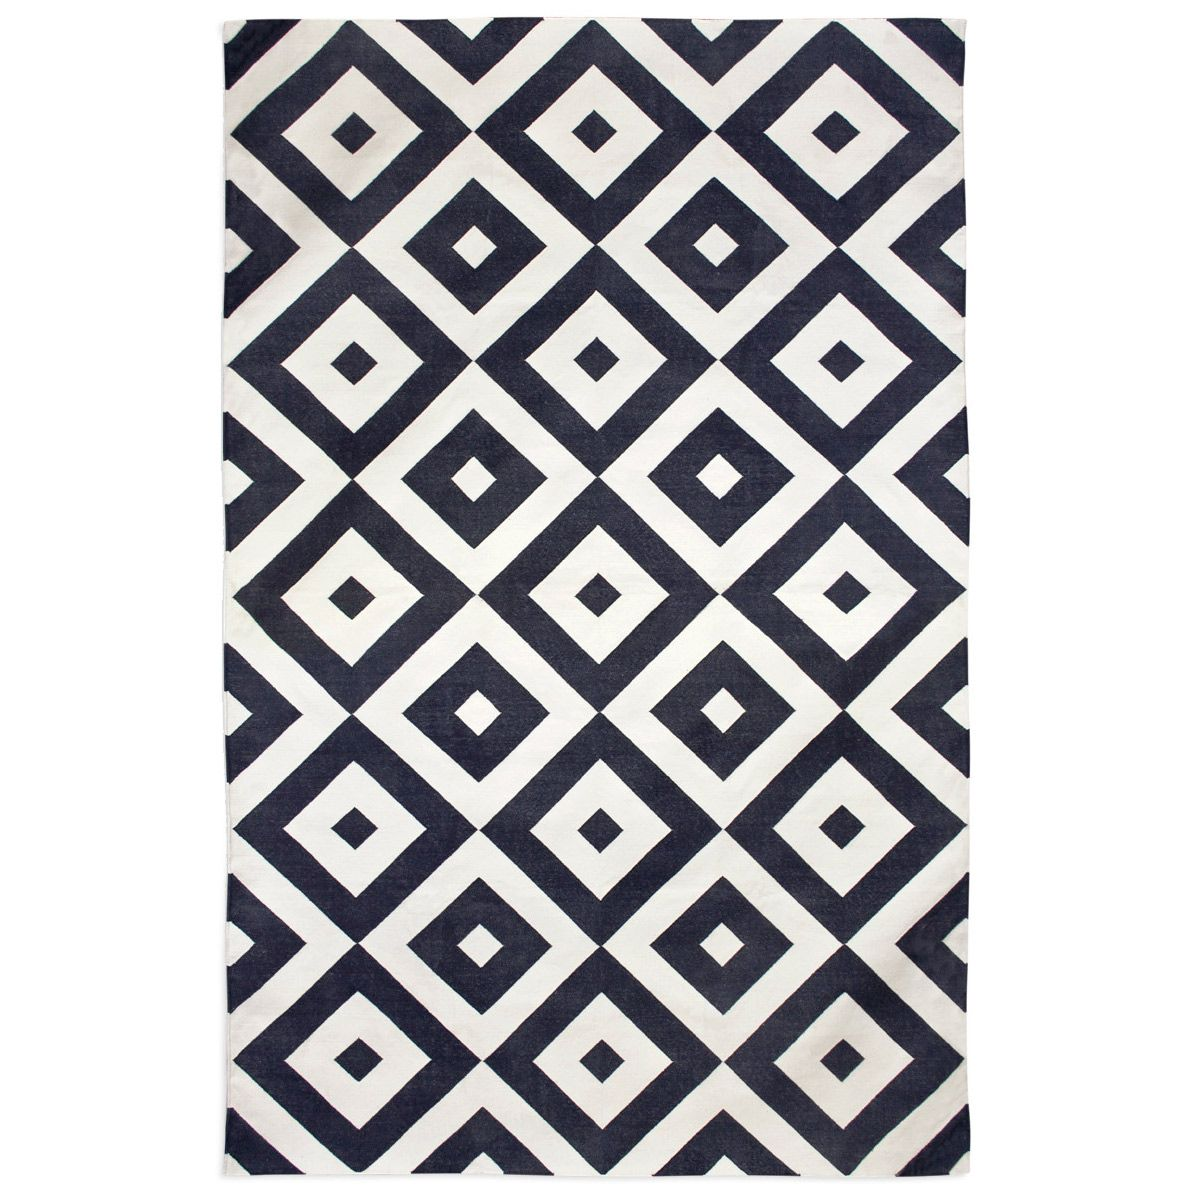 Jonathan Adler Kilim Gio Black White Handwoven Rug Zinc Door Rugs Geometric Area Rug Flat Weave Rug